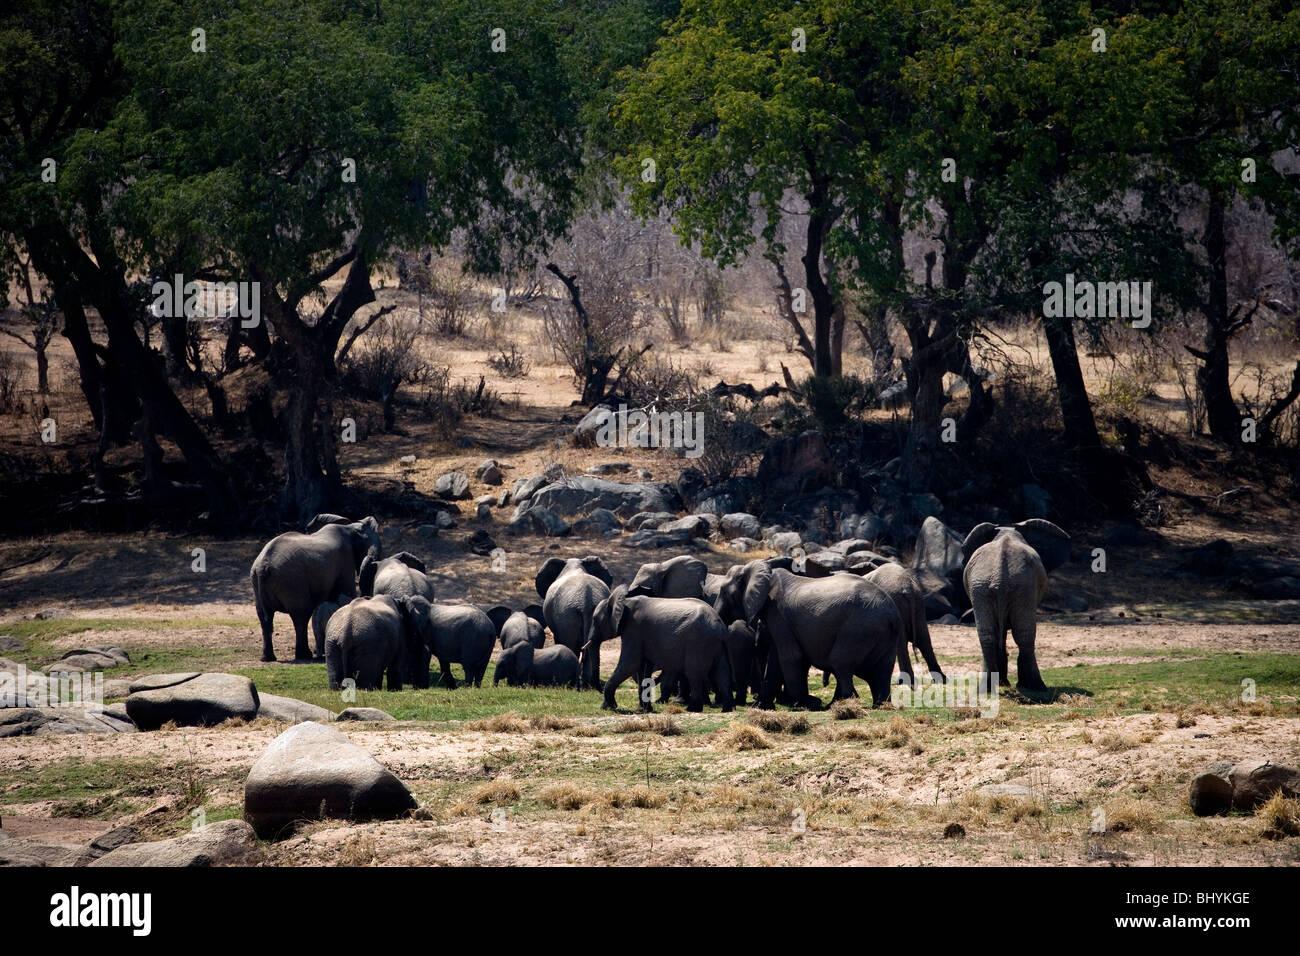 Family of elephants, Ruaha NP, Tanzania, East Africa - Stock Image